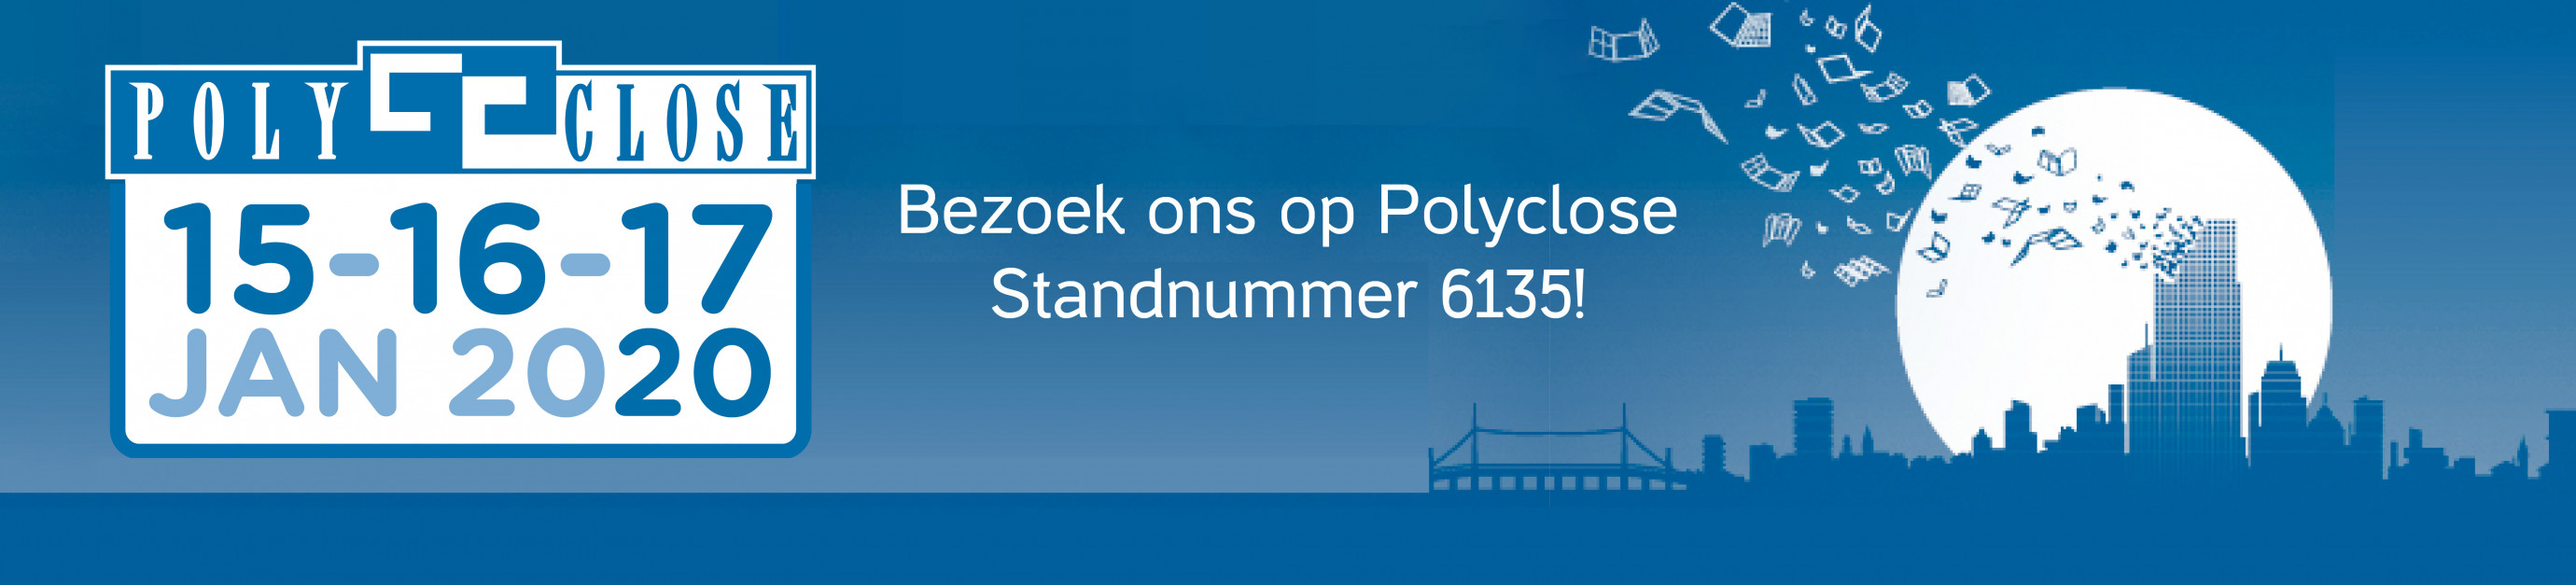 PolycloseNL20.jpg